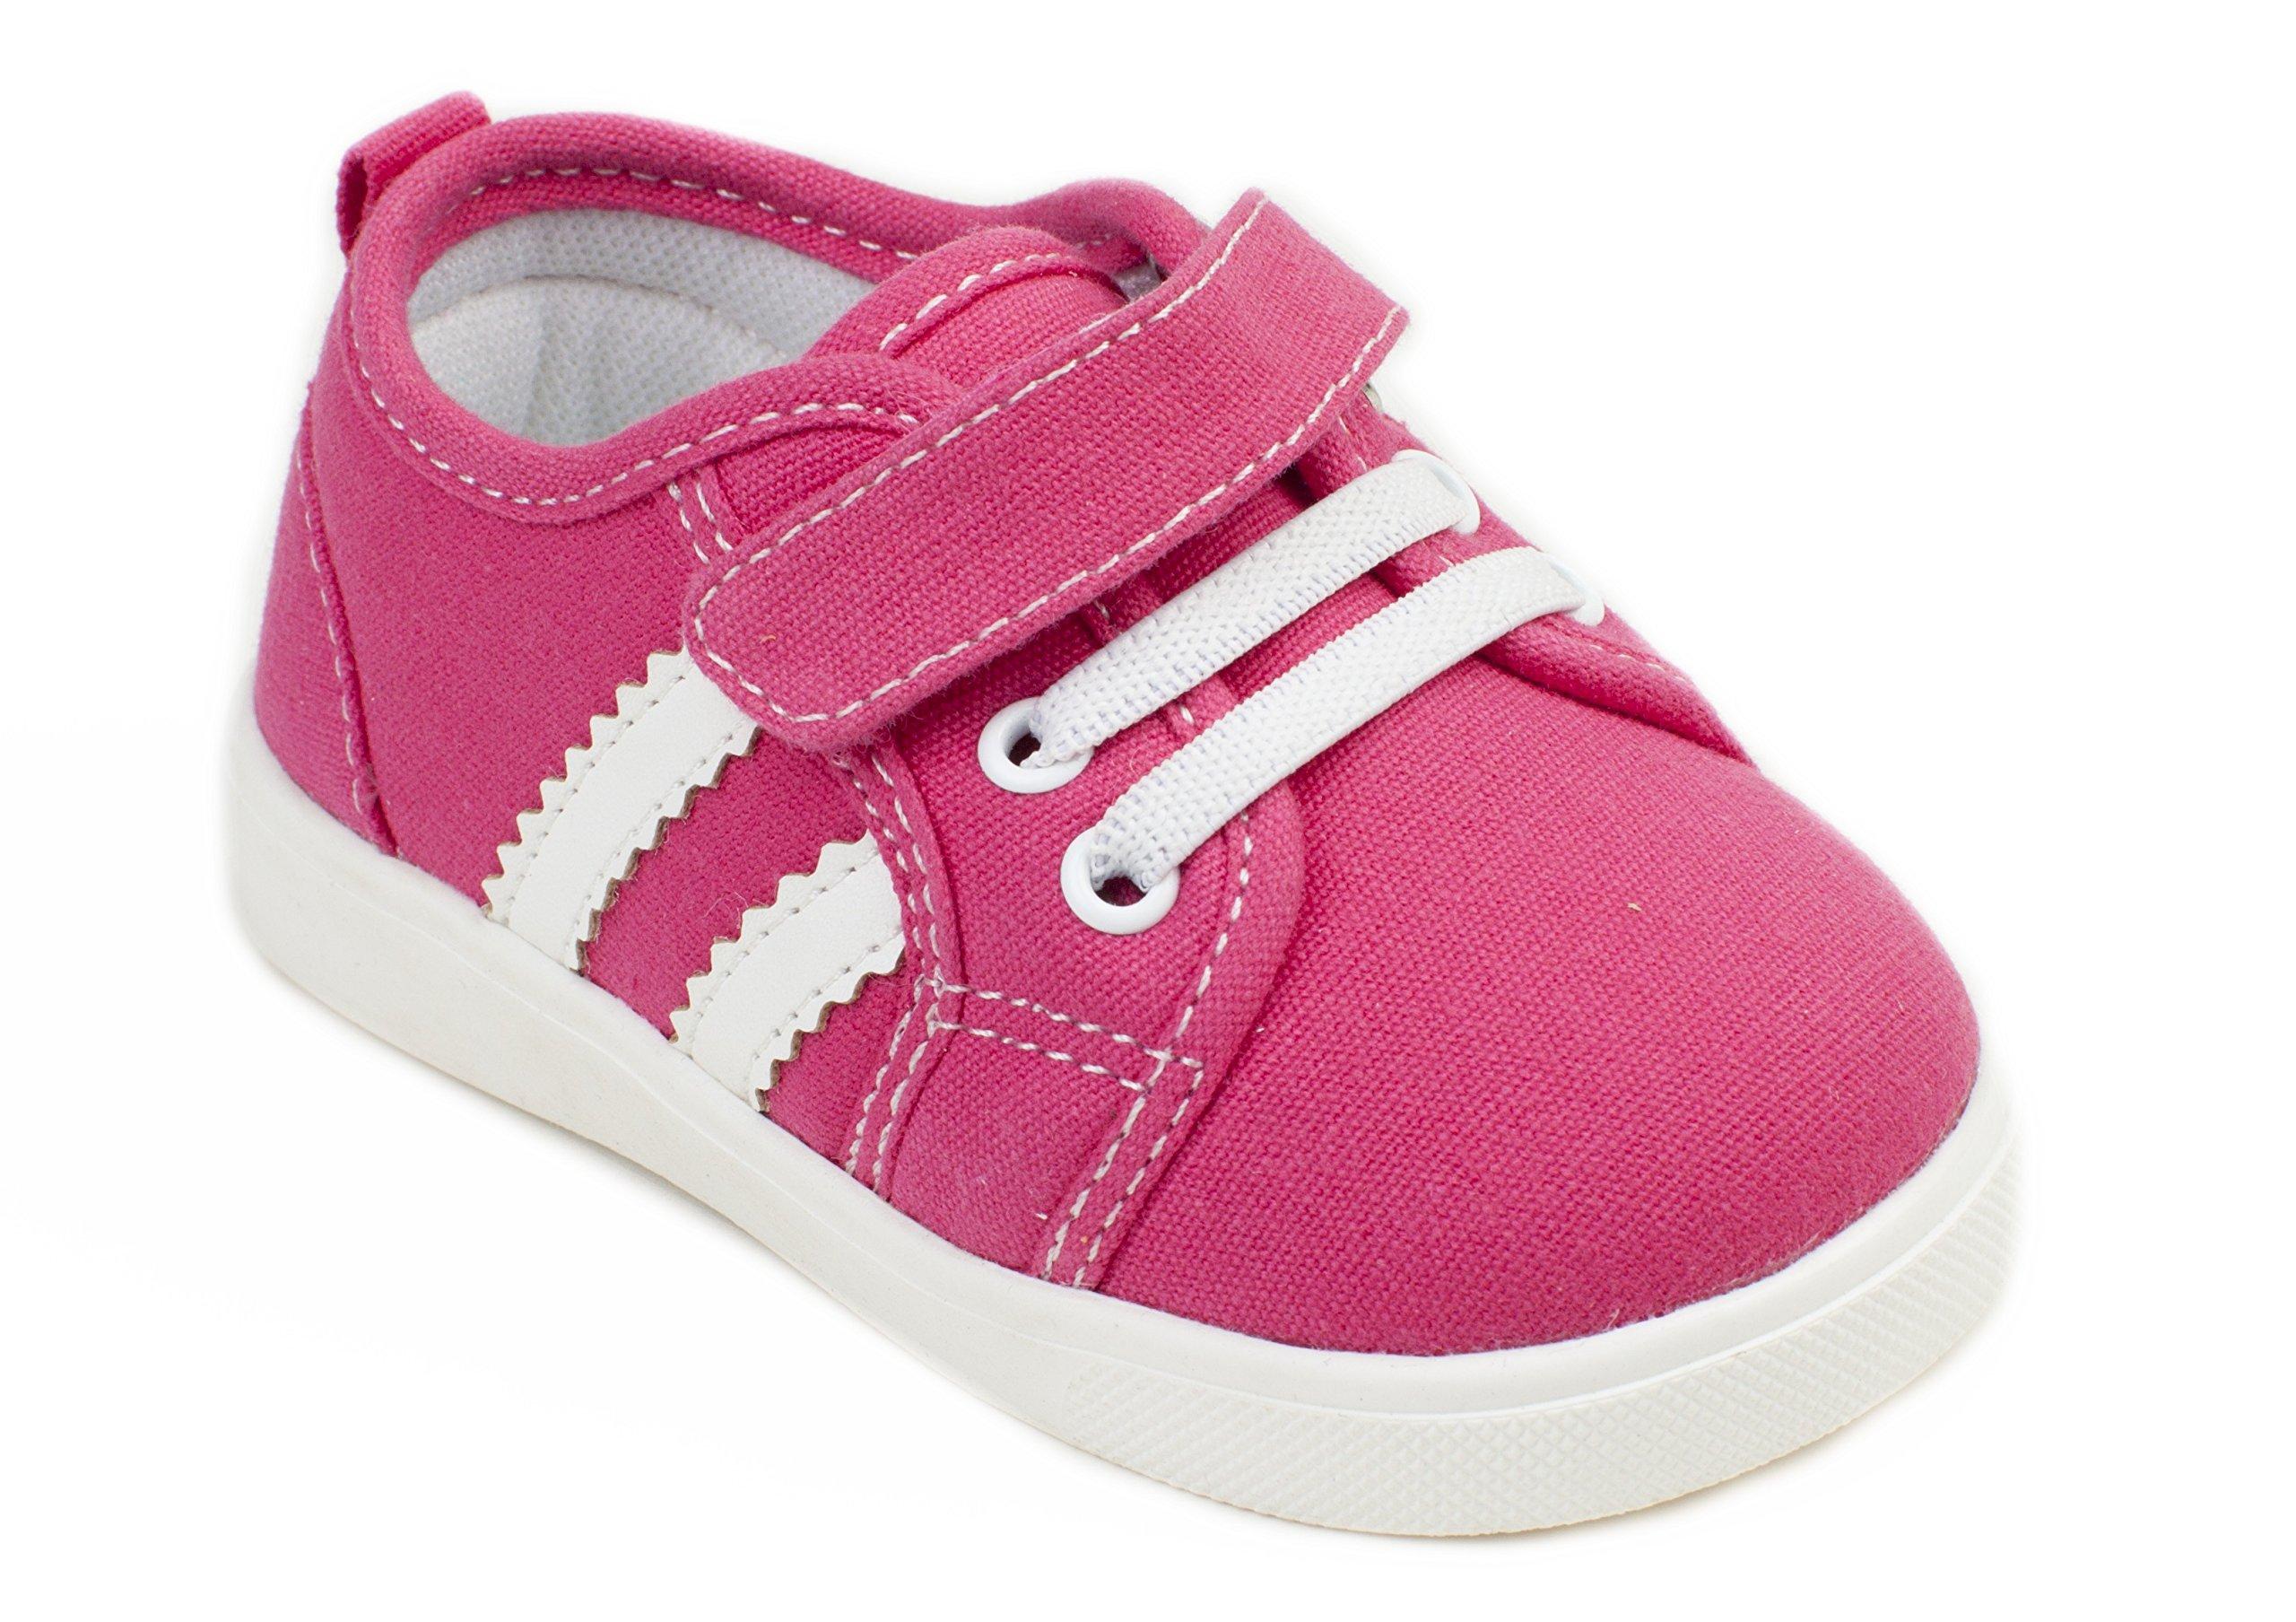 Wee Squeak Tennis Shoe Hot Pink - Size 9